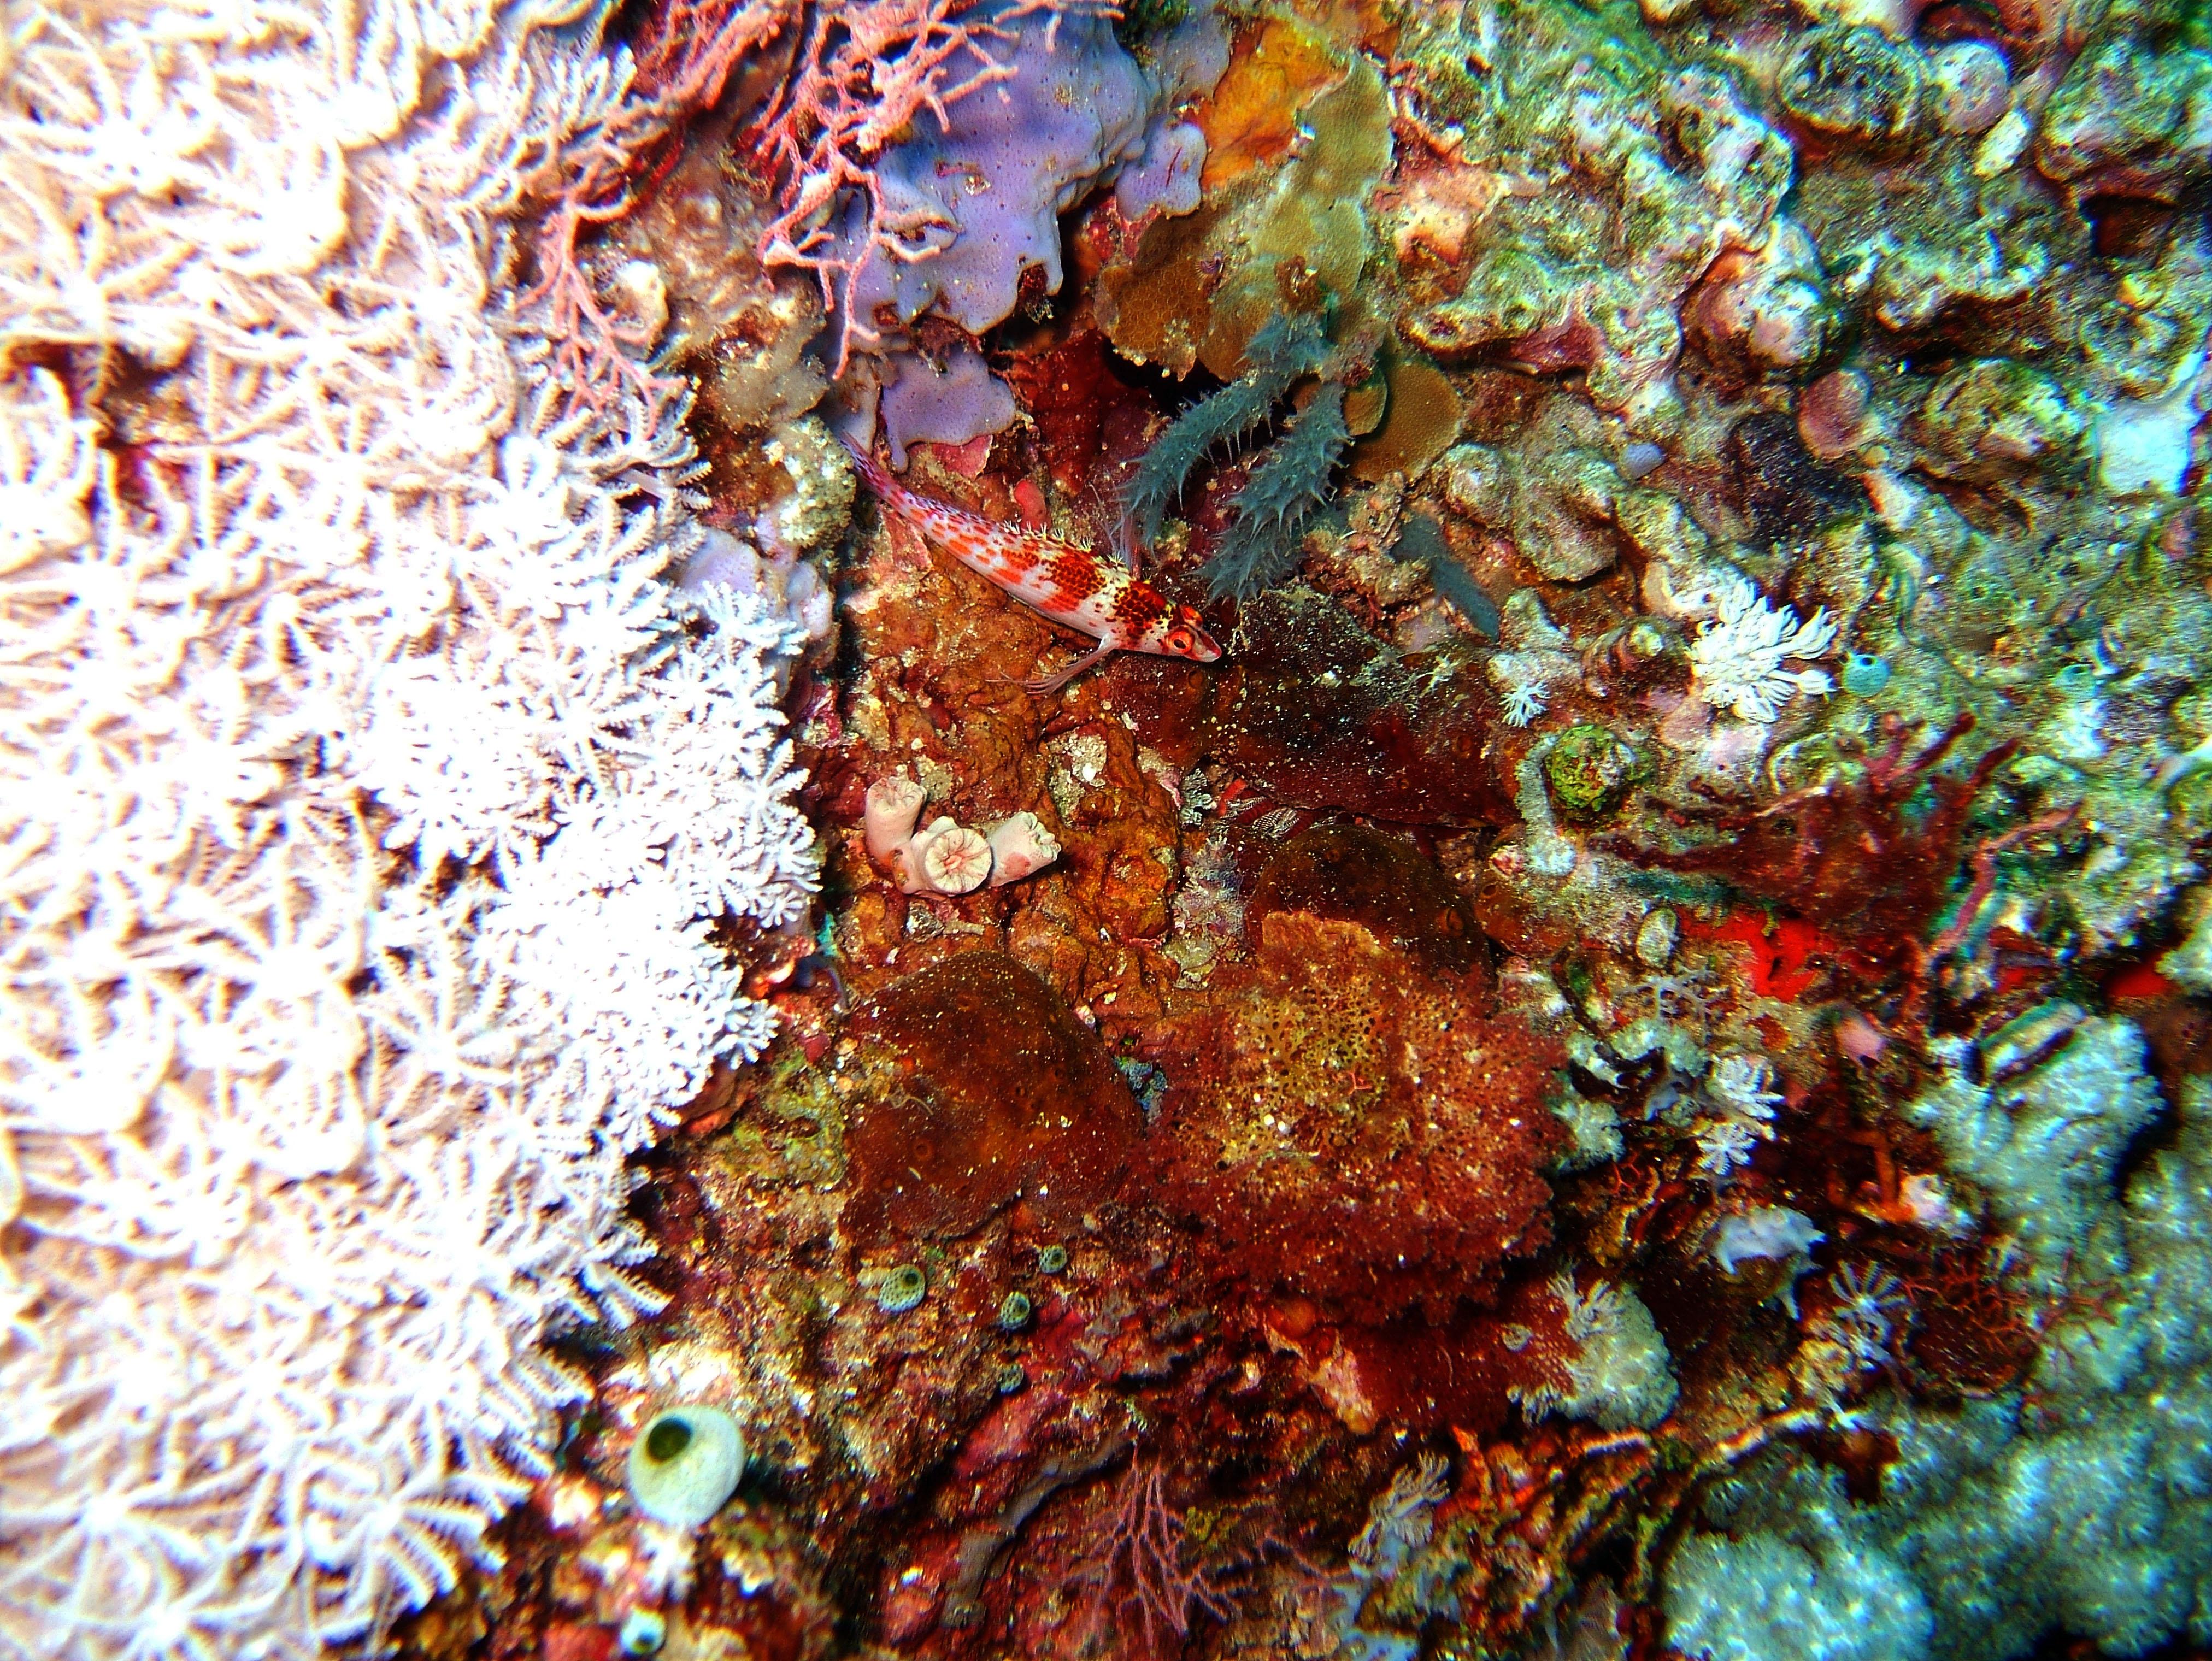 Dive 20 Philippines Mindoro Sabang Shark Cave Oct 2005 07